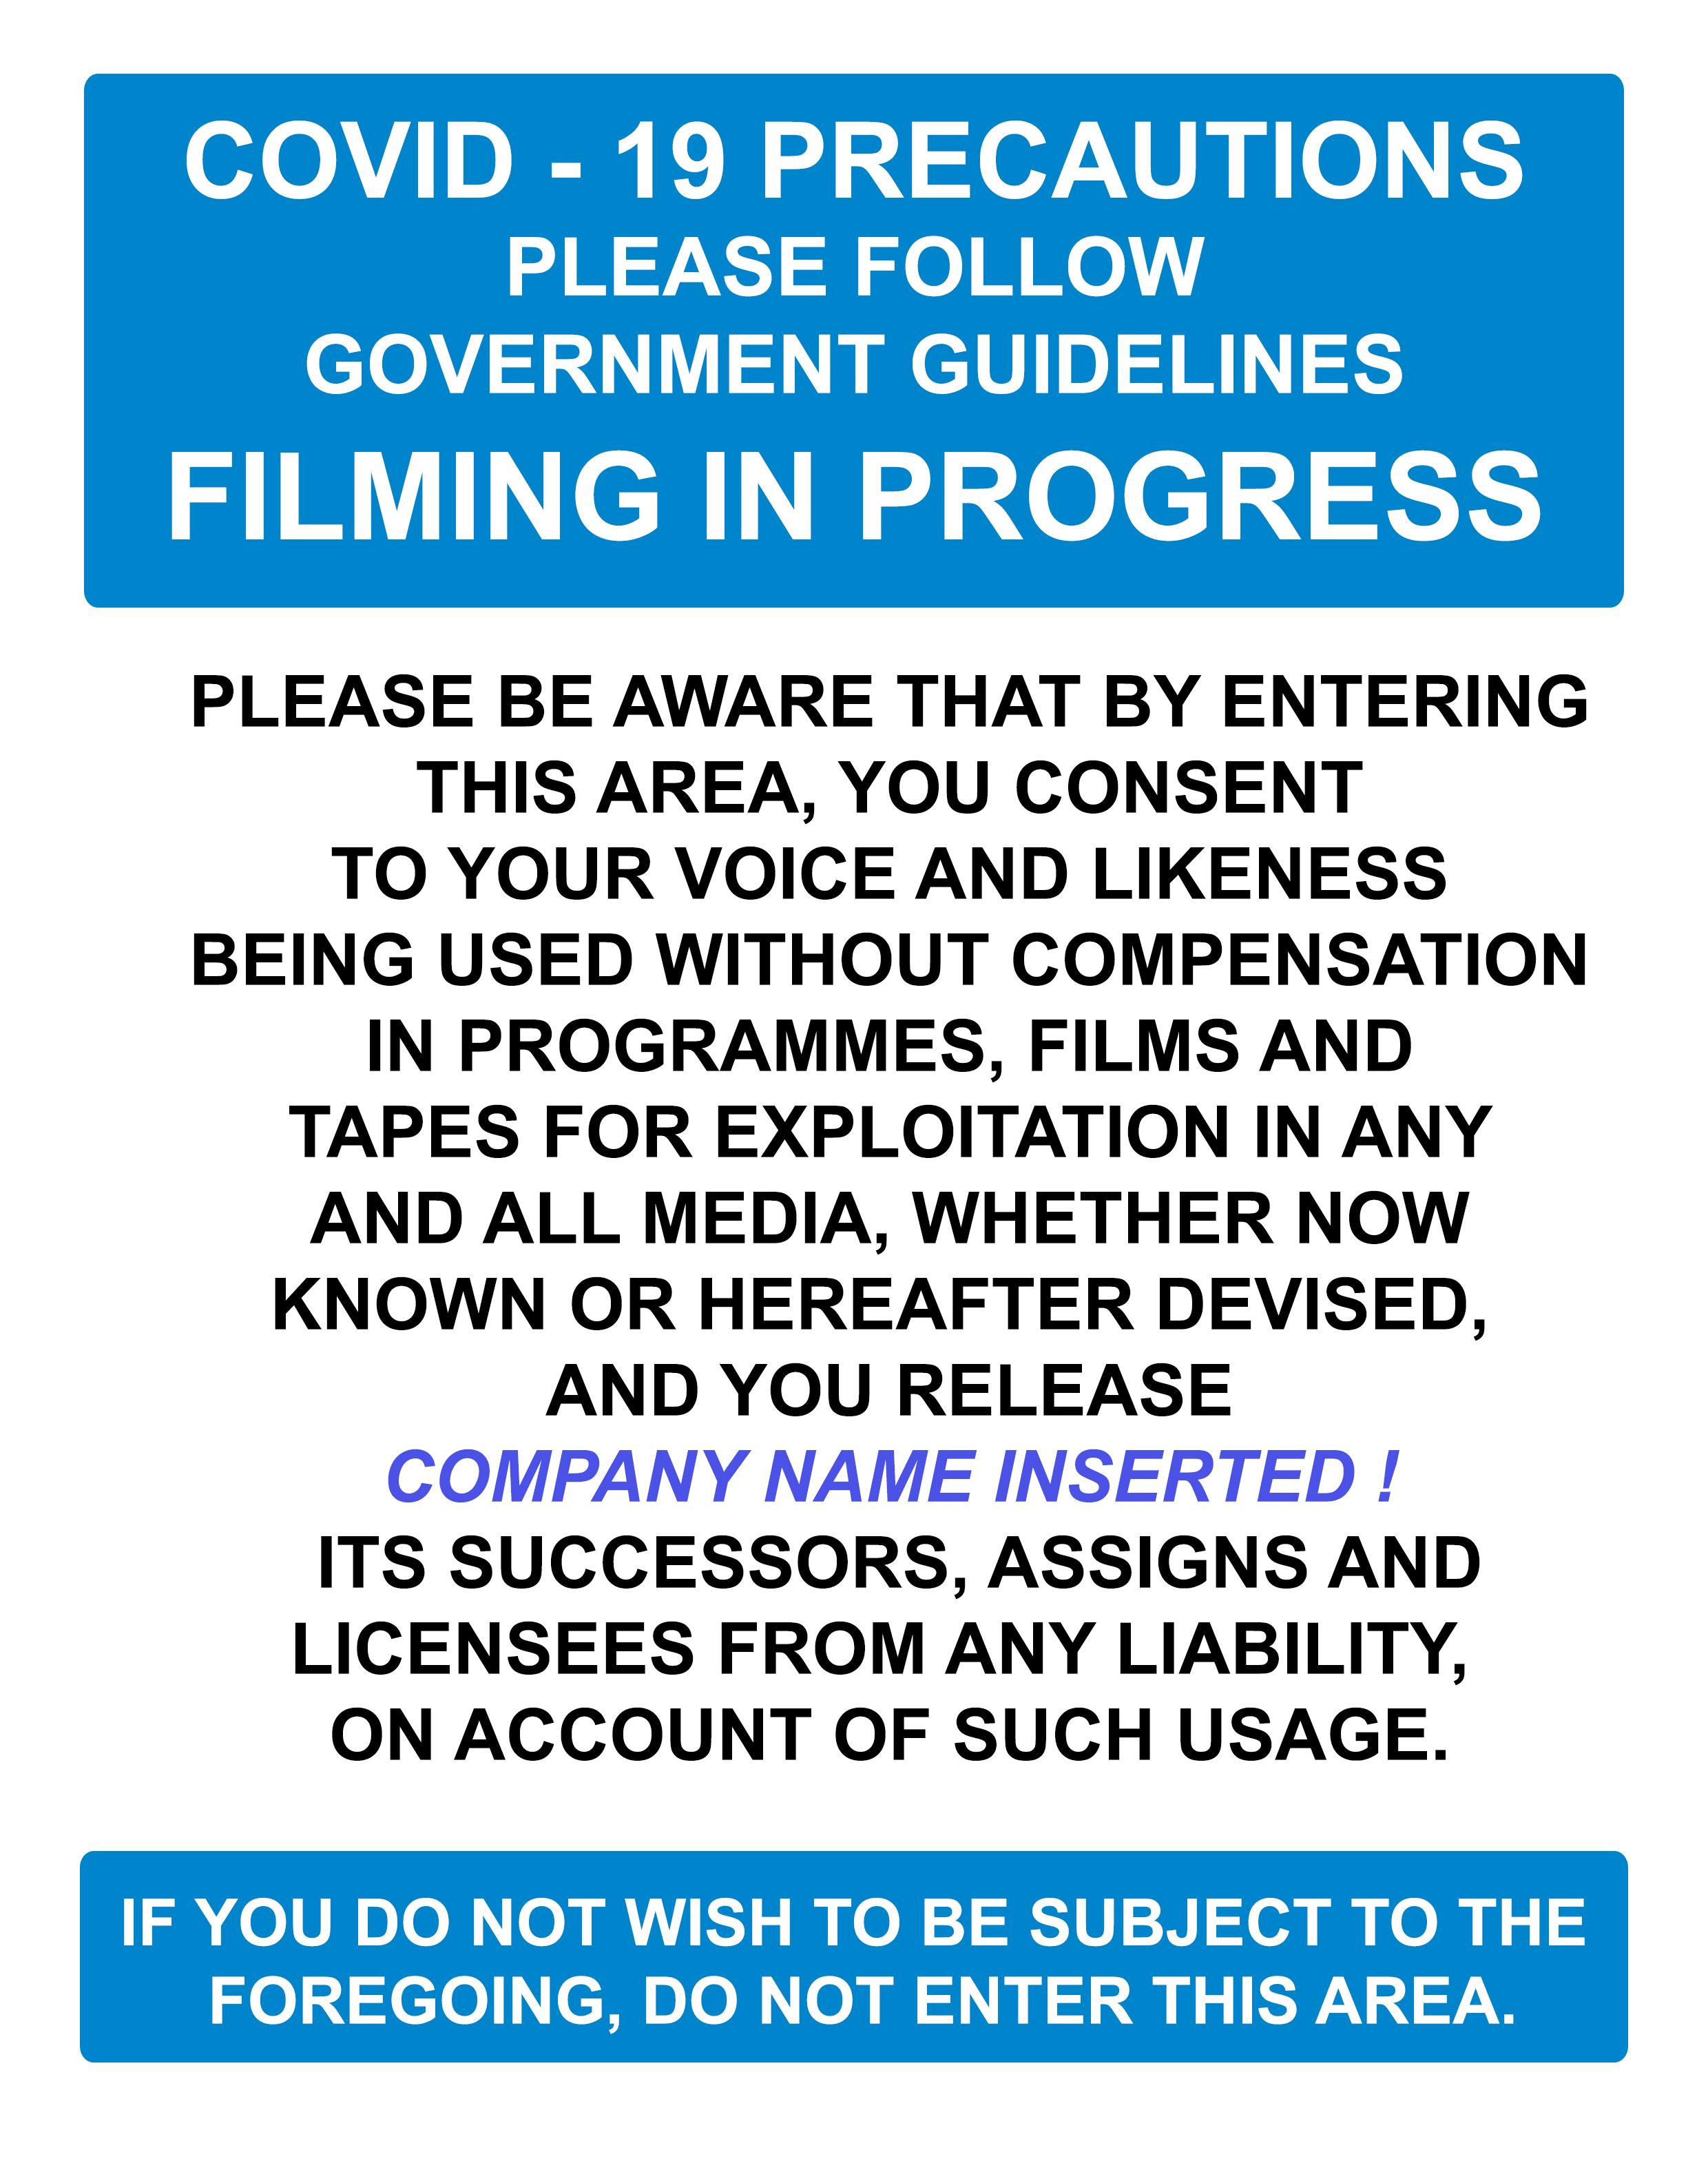 A1 COVID PRECAUTIONS FILMING  NOTICE